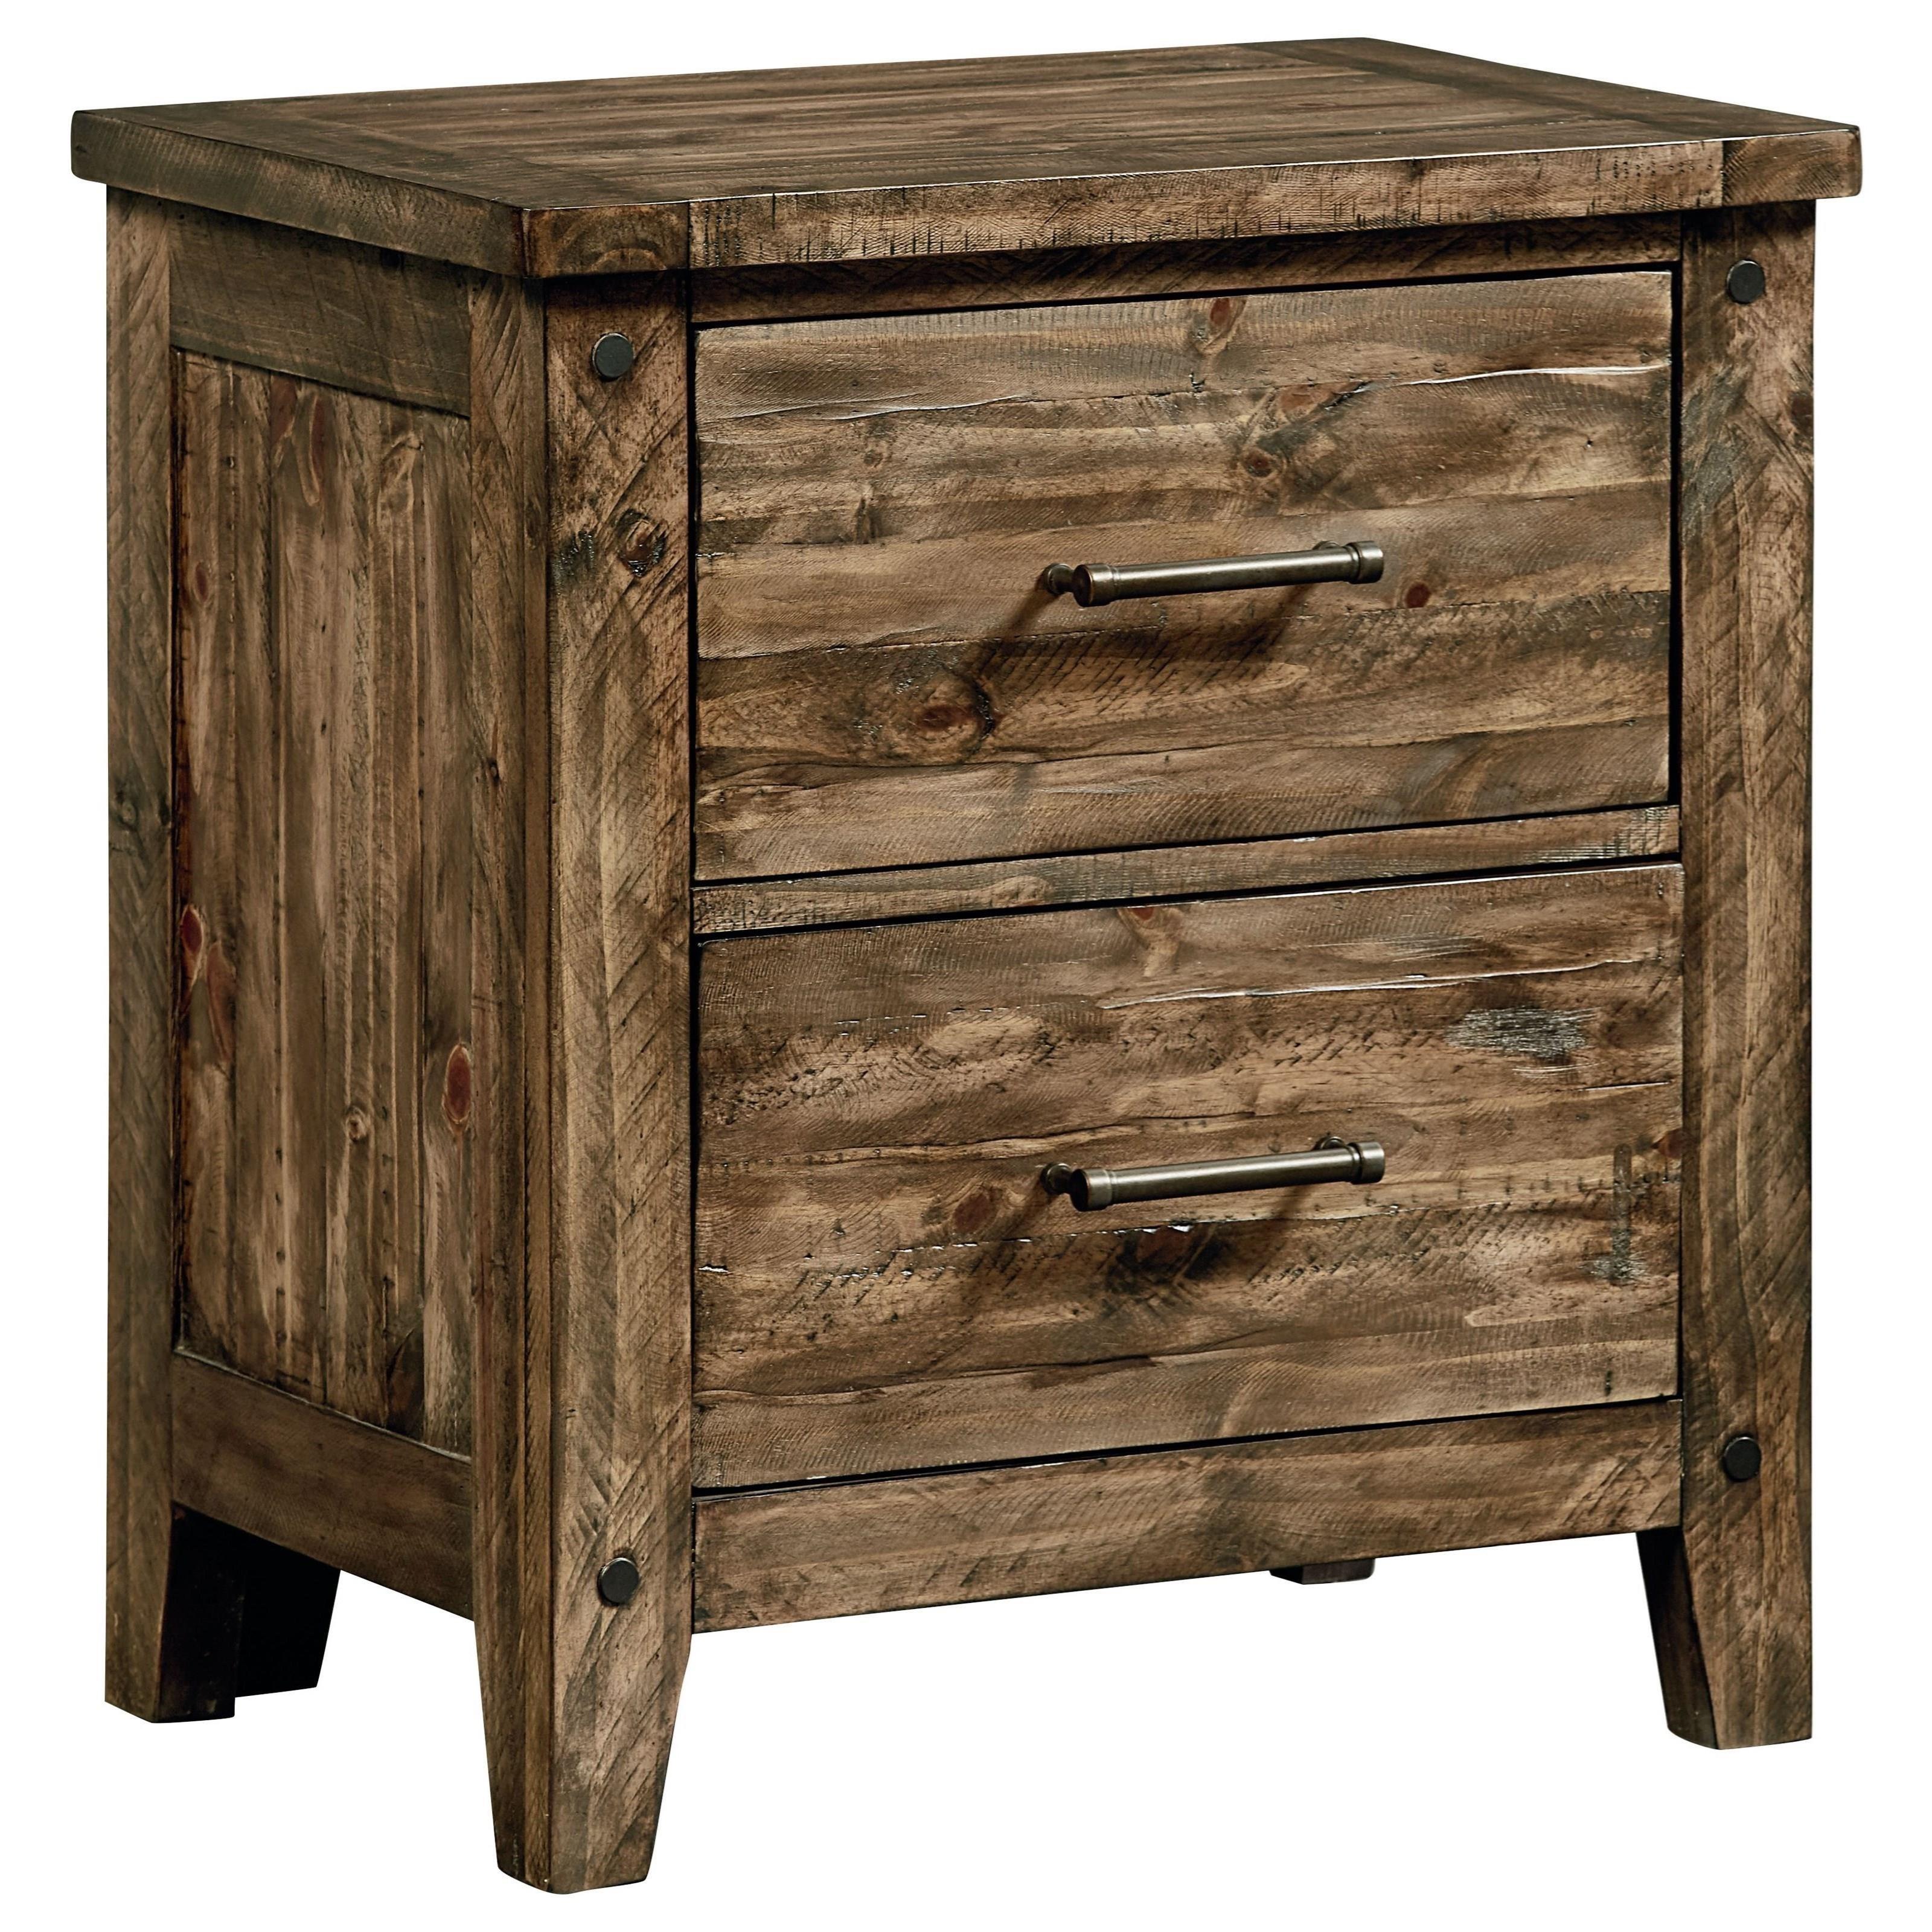 Standard Furniture Nelson 92507 Rustic Nightstand Great